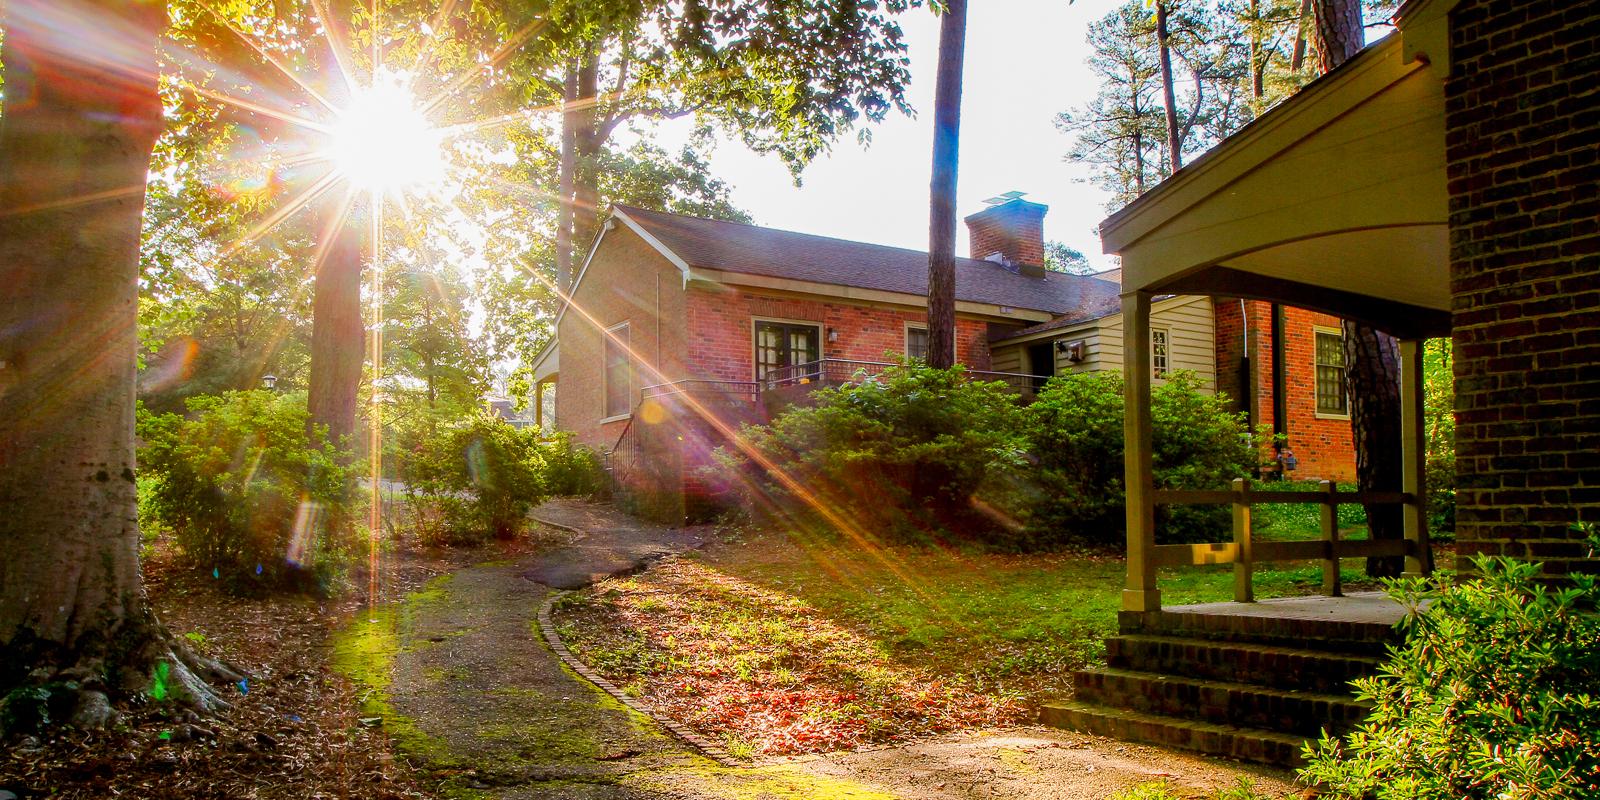 160525-wm-lodges-exteriors-0068-web-ready